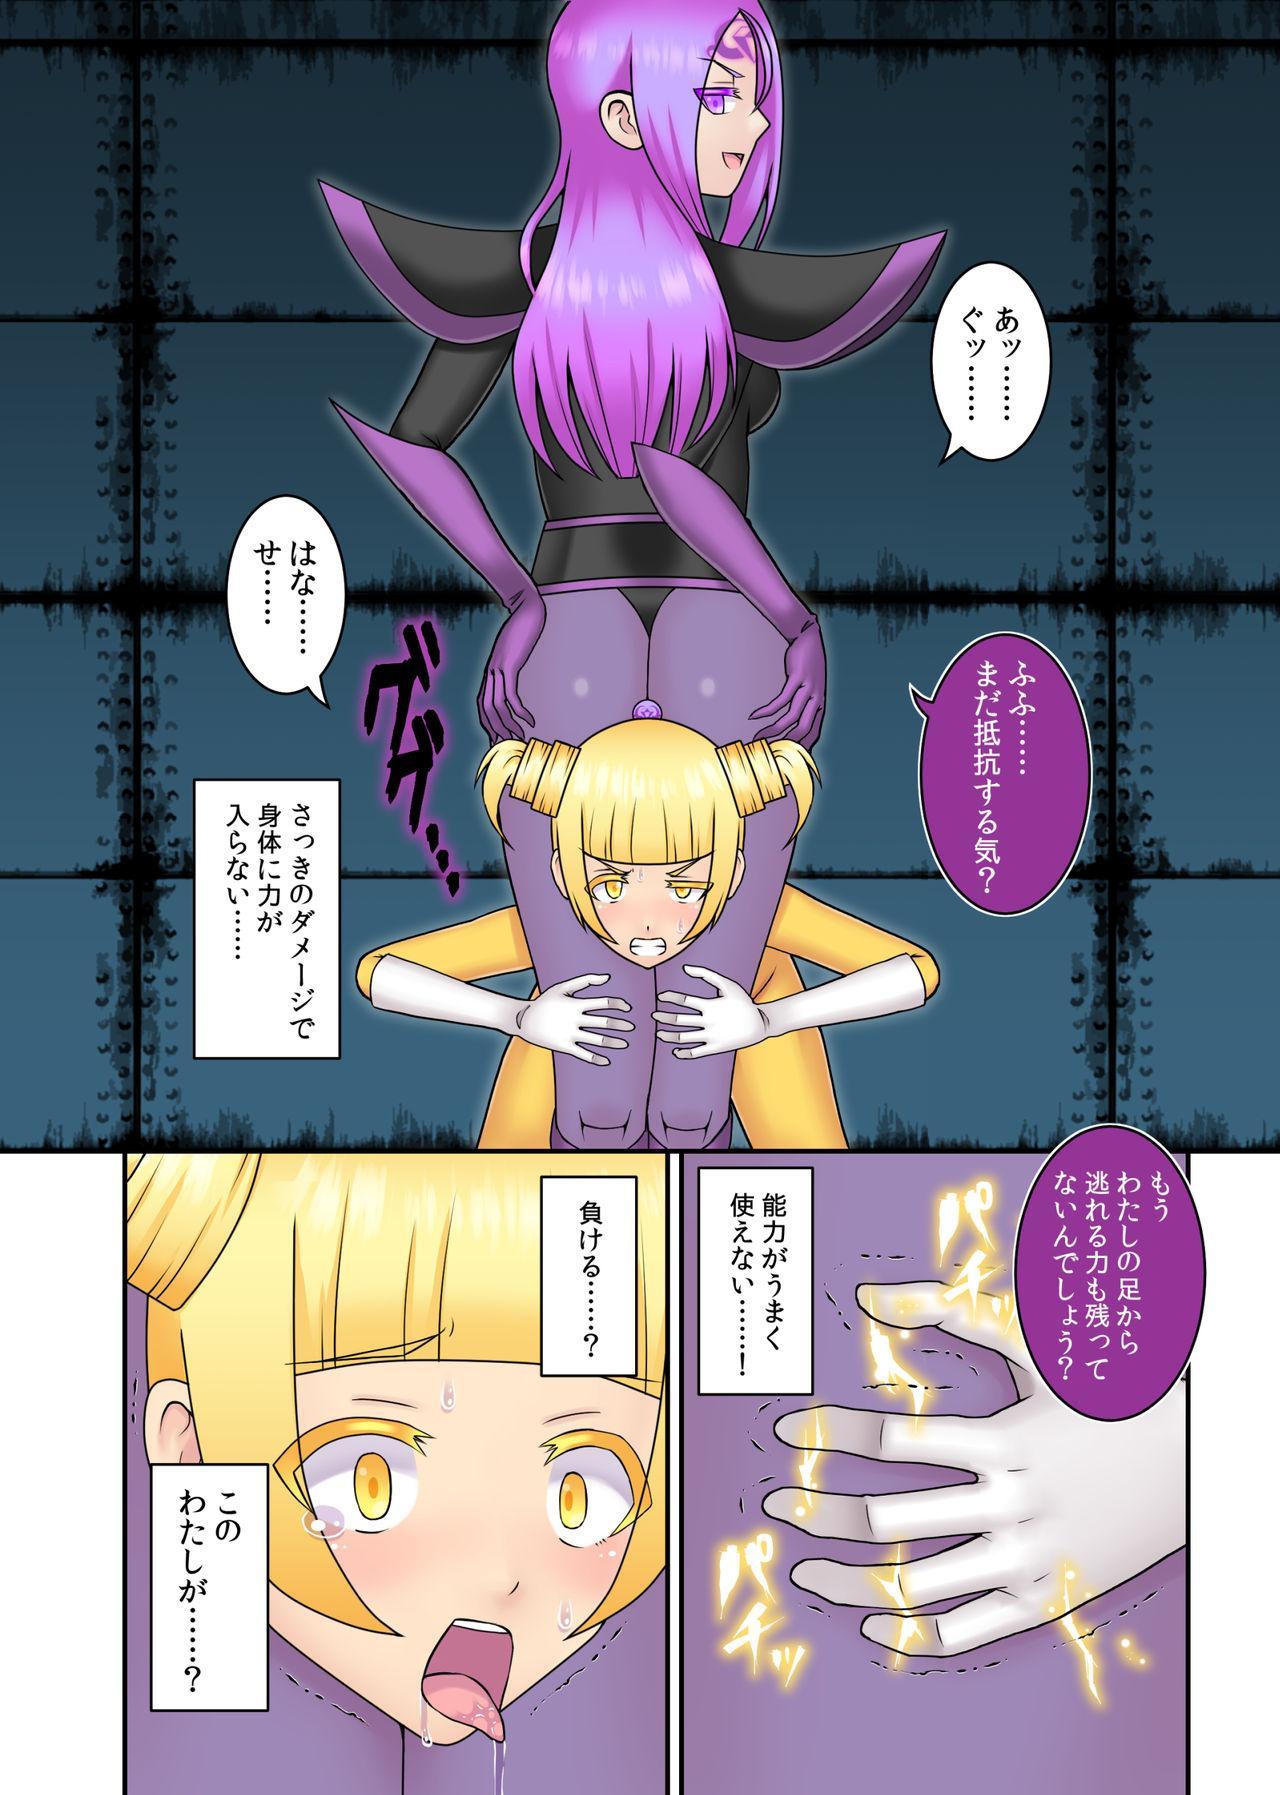 [STUDIO HP+ (IceLee)] Teisou Sentai Virginal Colors Dai-Go-wa 14